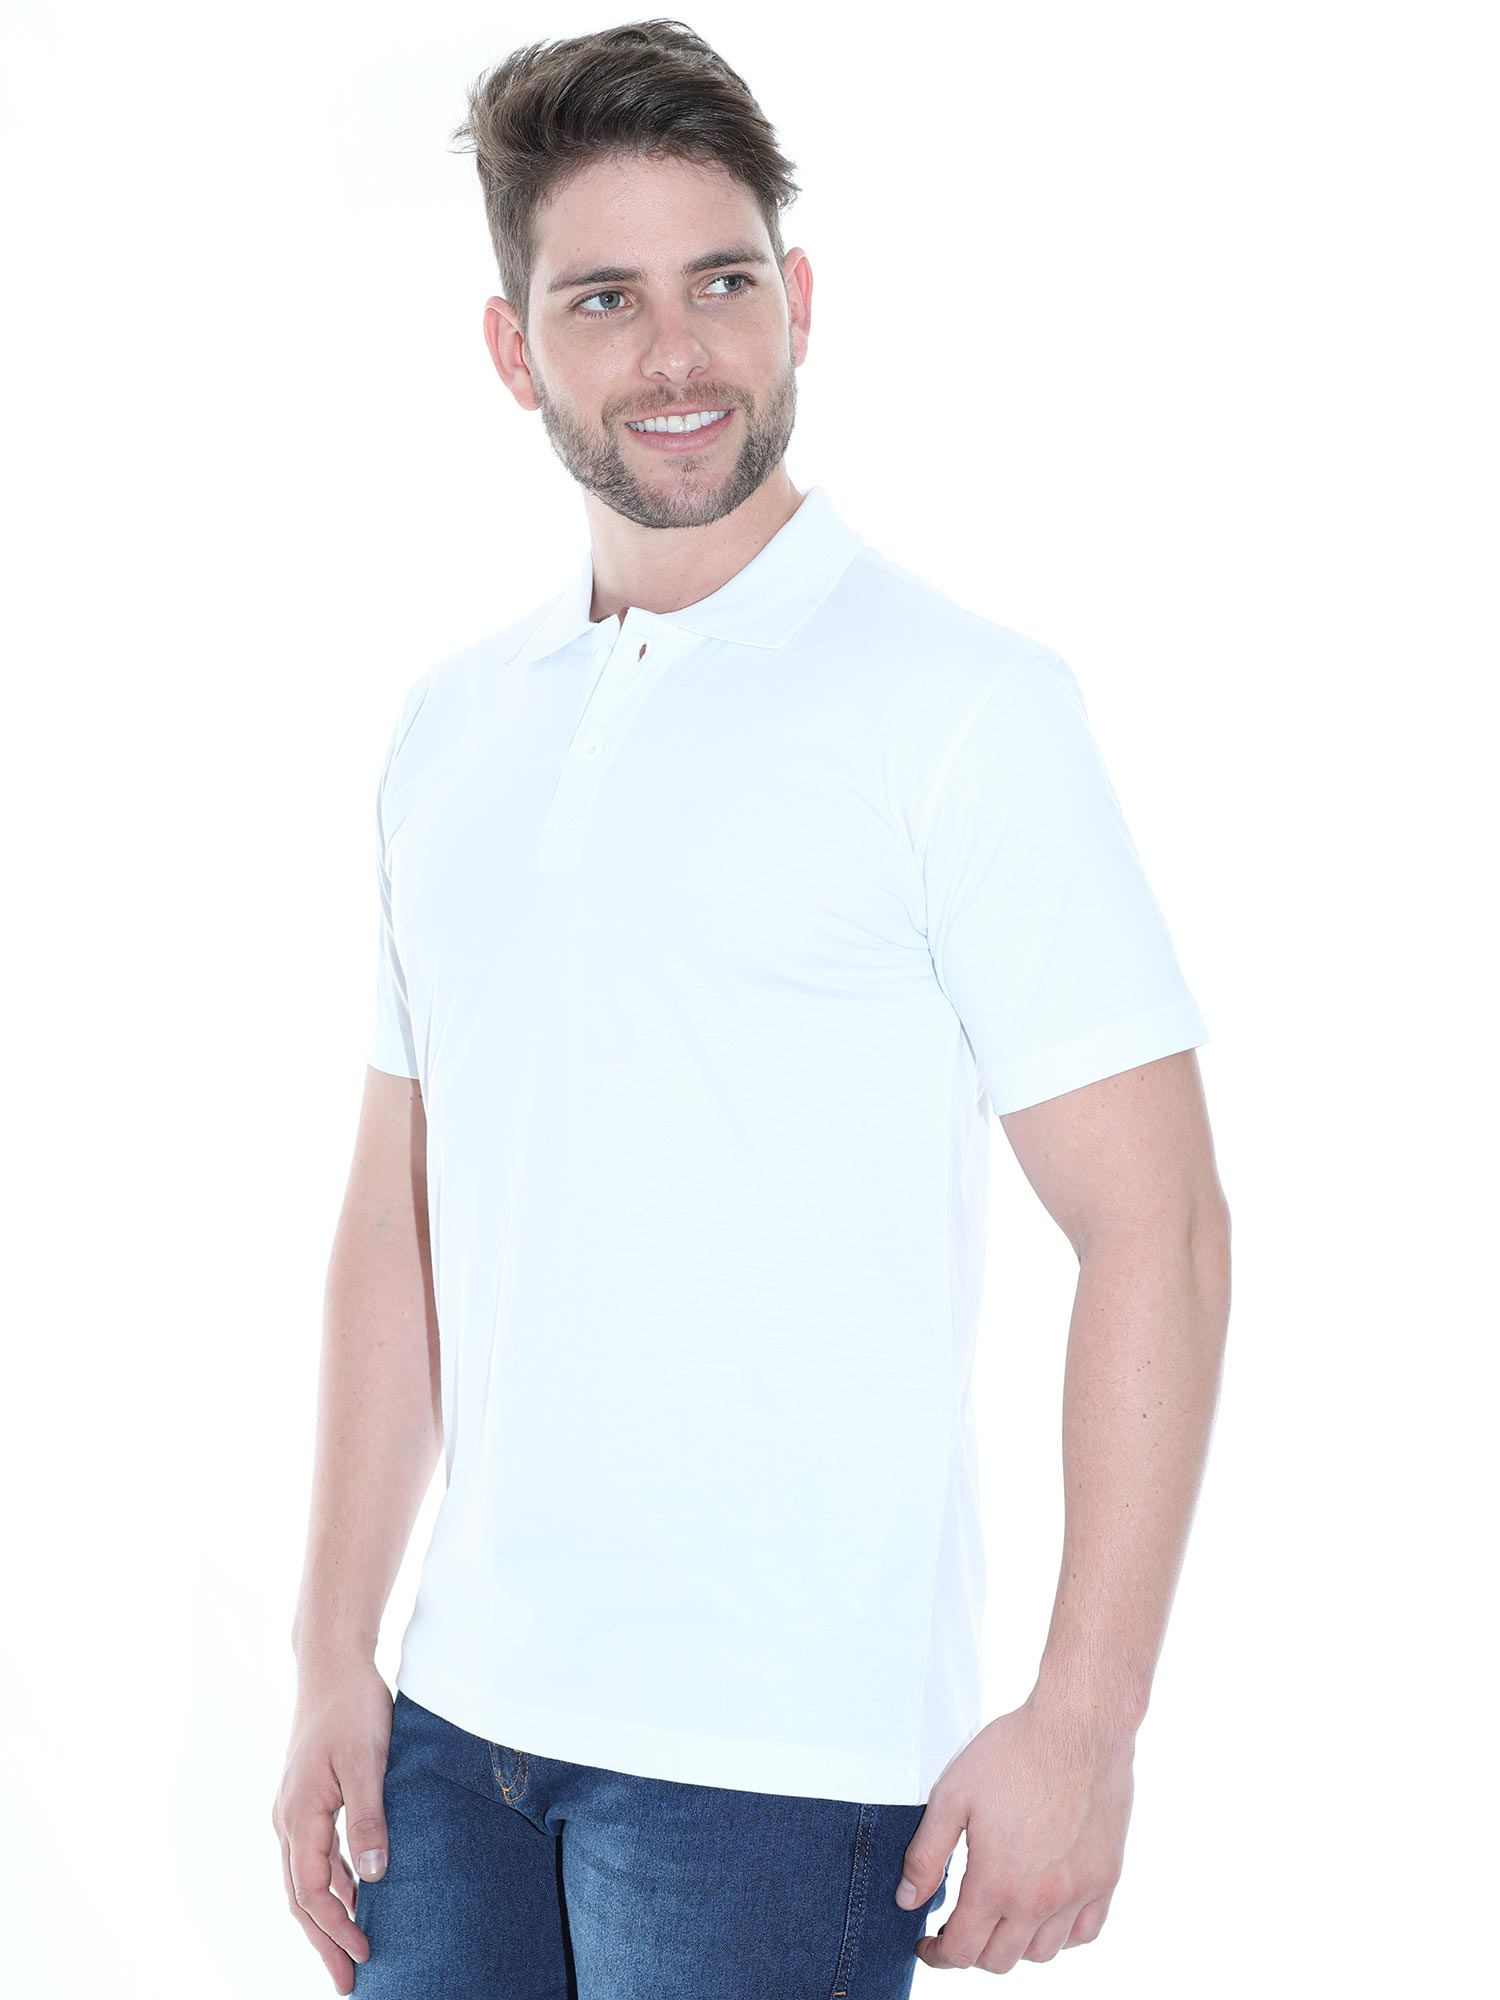 Camisa Polo Masculina Básica Algodão Lisa Conforto Branca